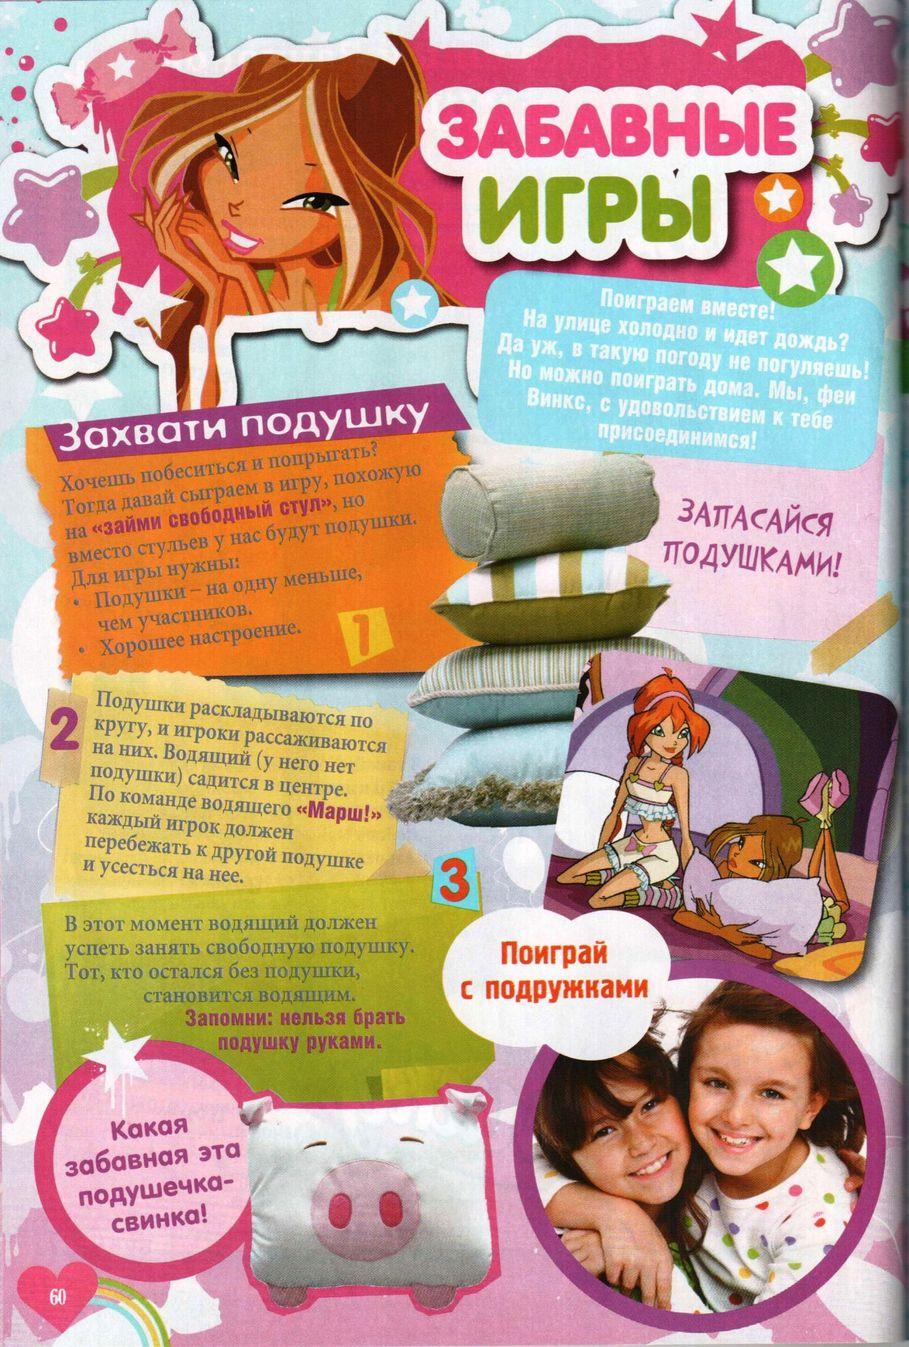 Комикс Винкс Winx - Опасный замысел (Журнал Винкс №10 2011) - стр. 61